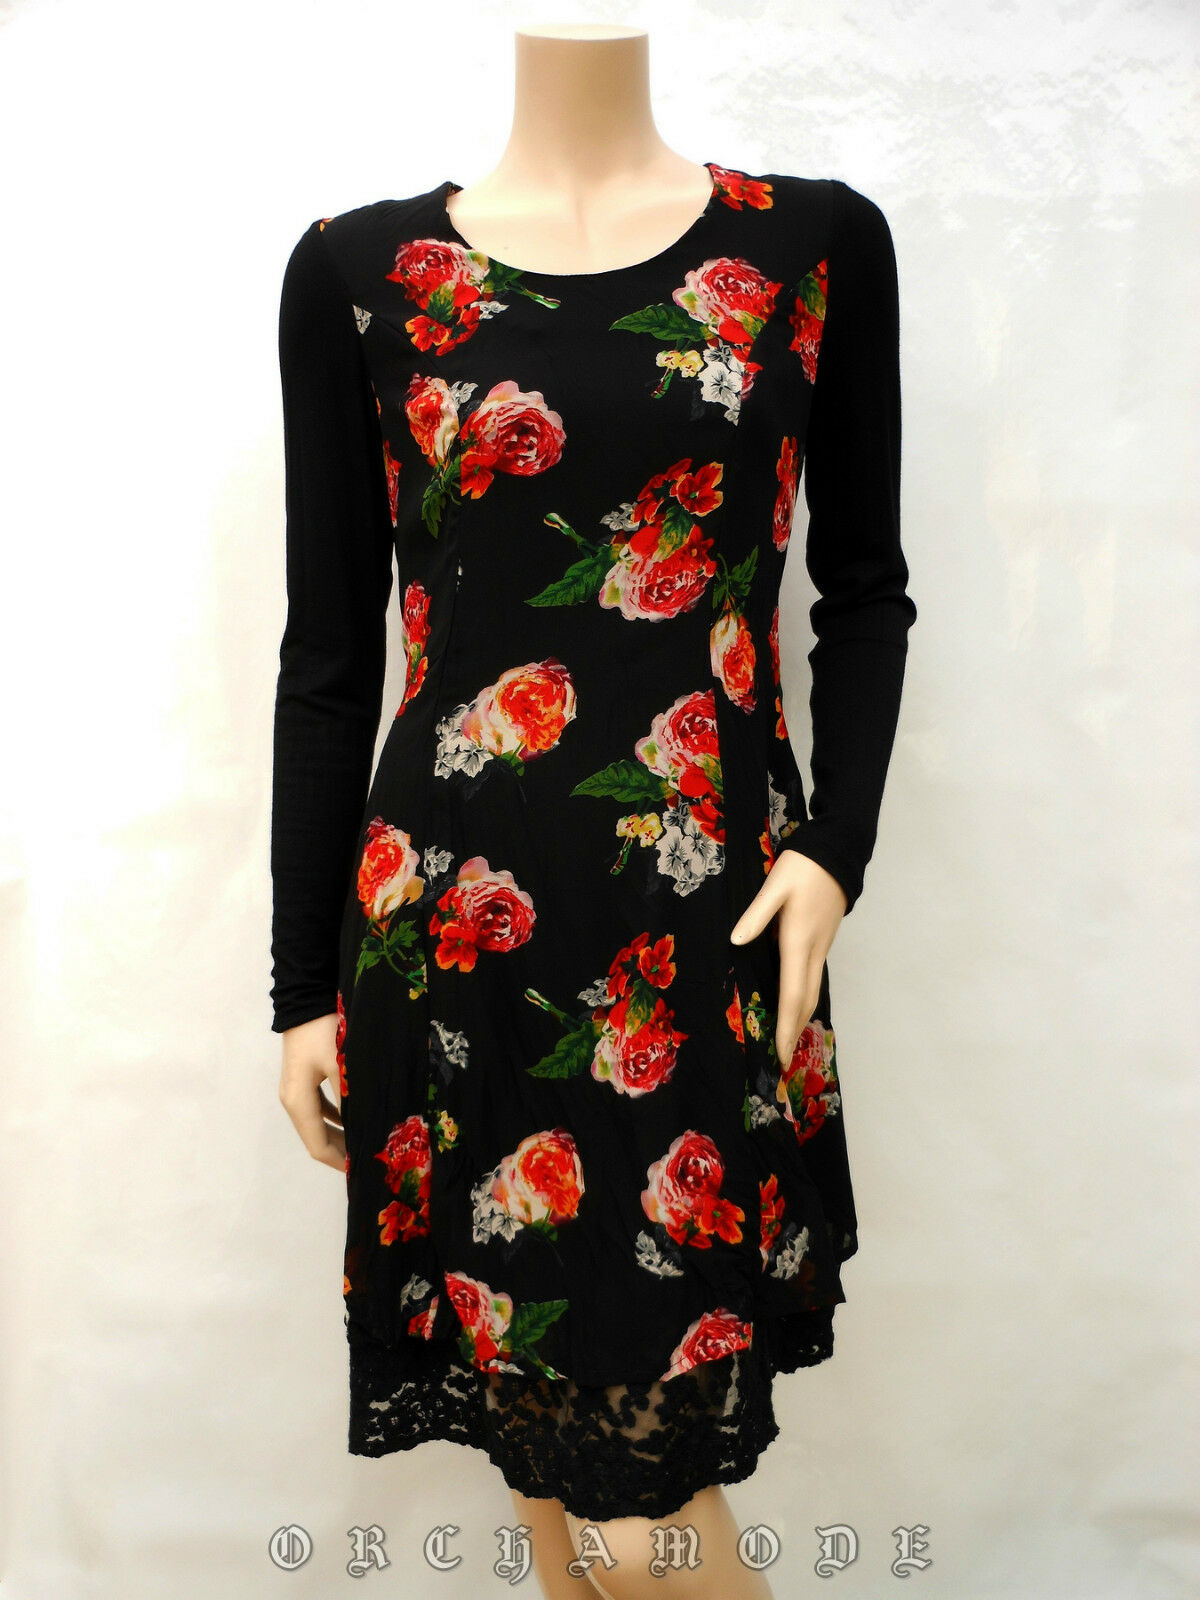 Robe MY DESIGN T 40 L 3 schwarz Floral Volant dentelle Manche Fête Dress Kleid NEUF